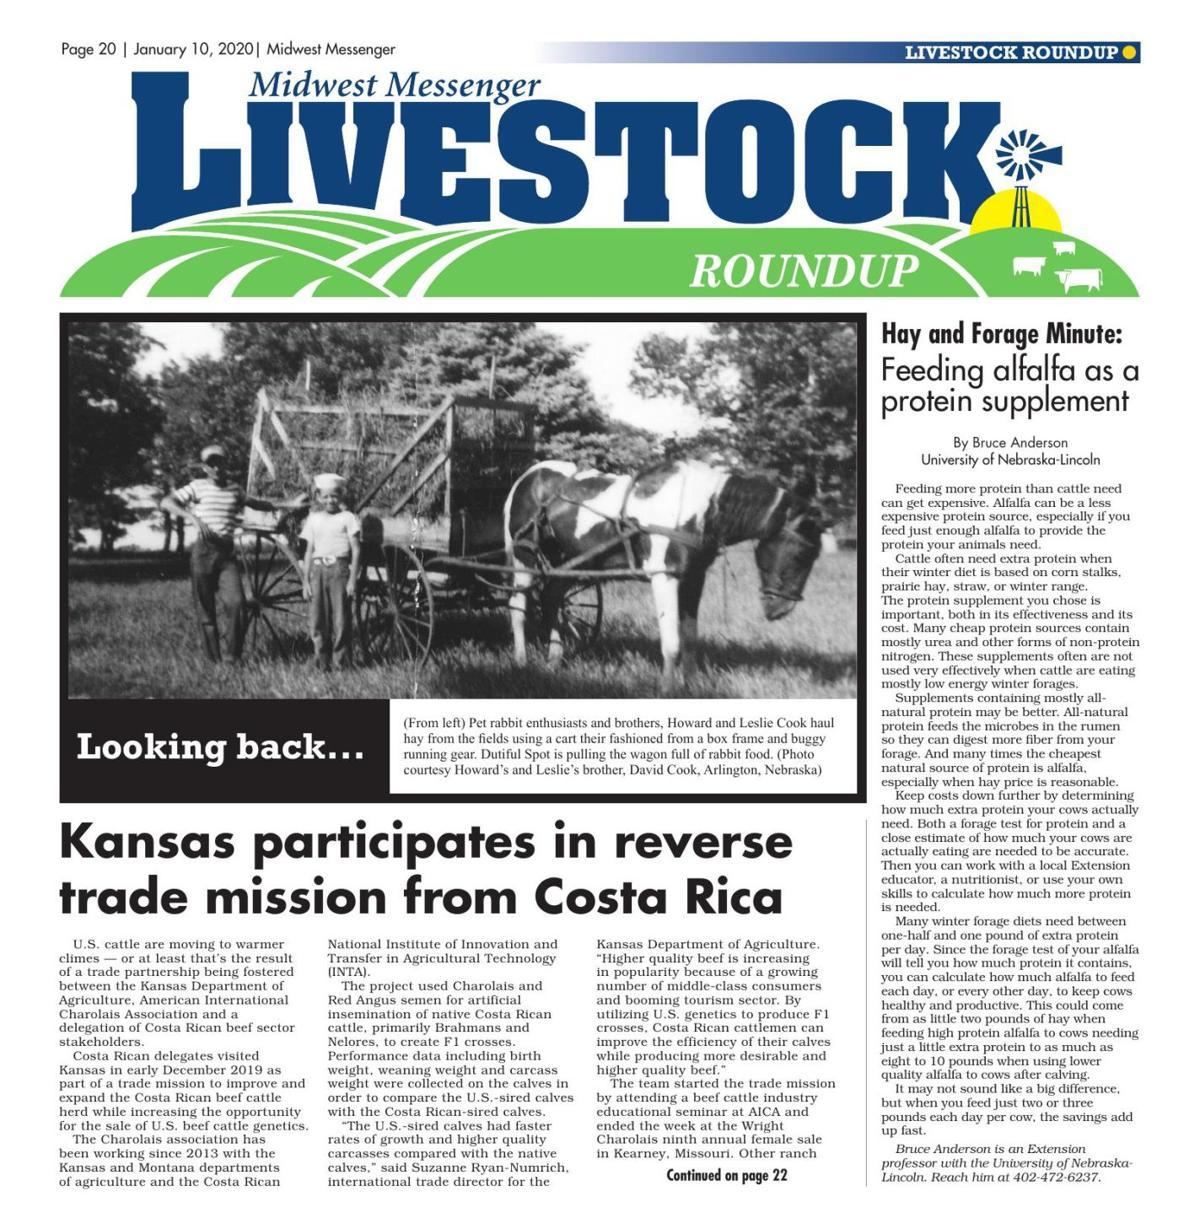 Livestock Roundup 1/10/20